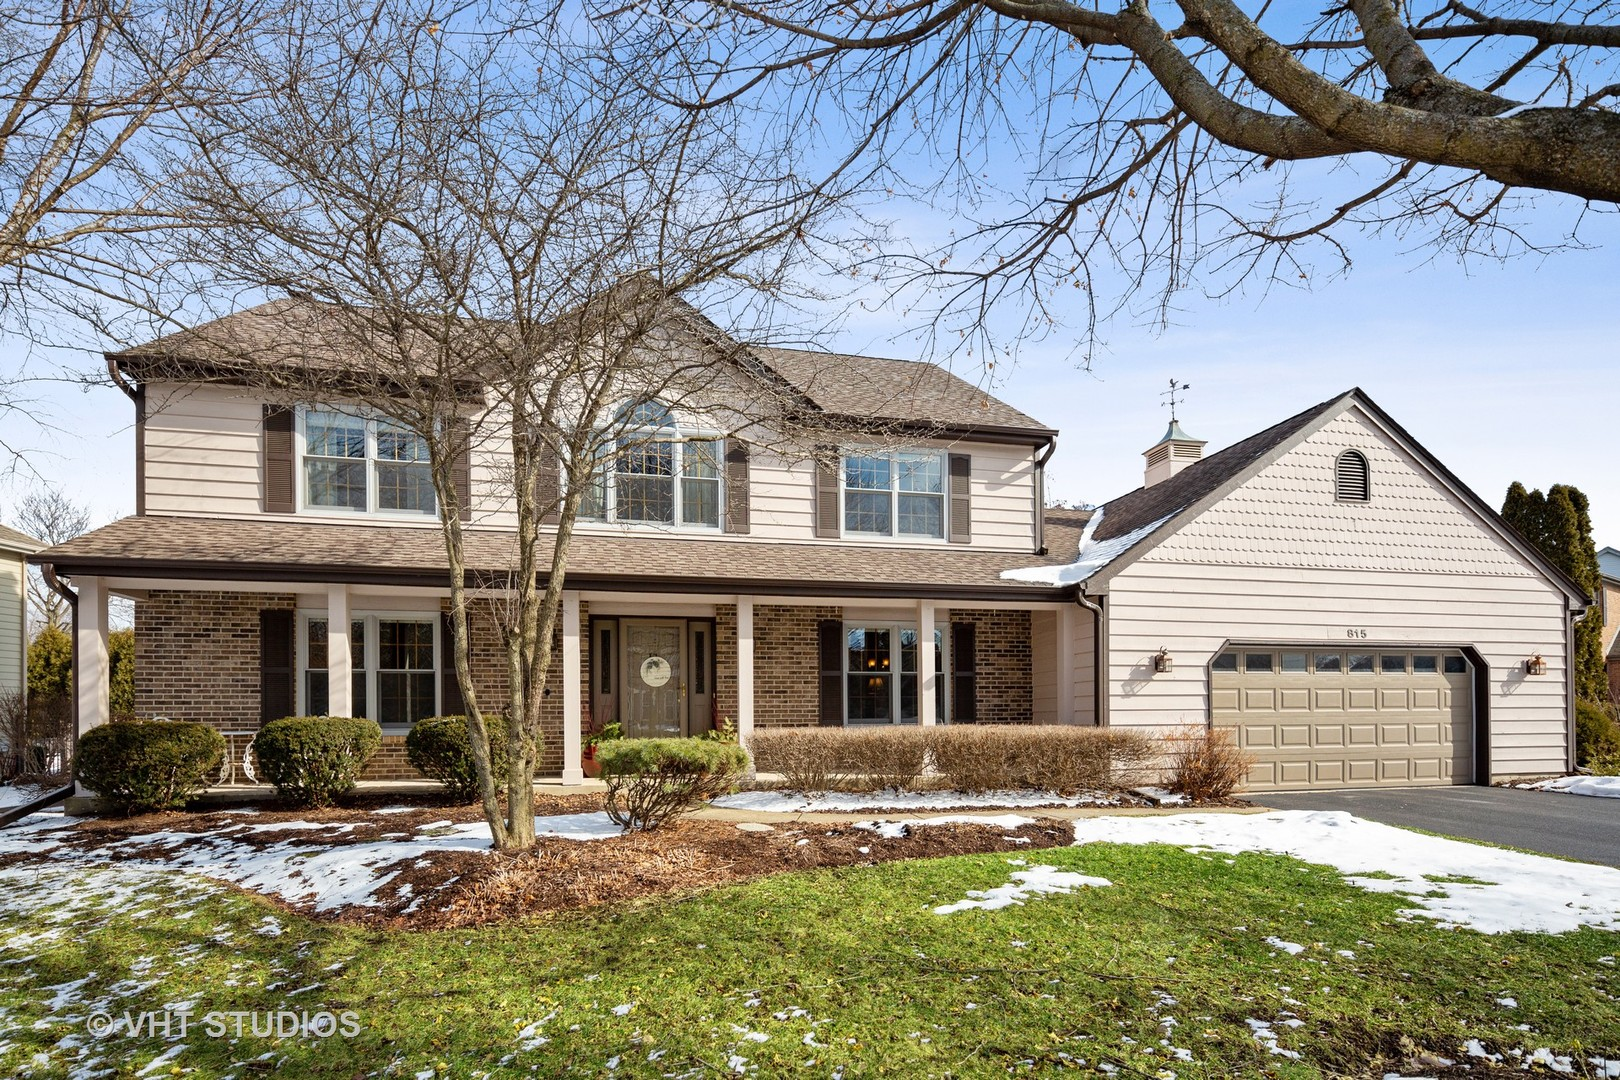 815 White Pine Drive, Cary, IL 60013